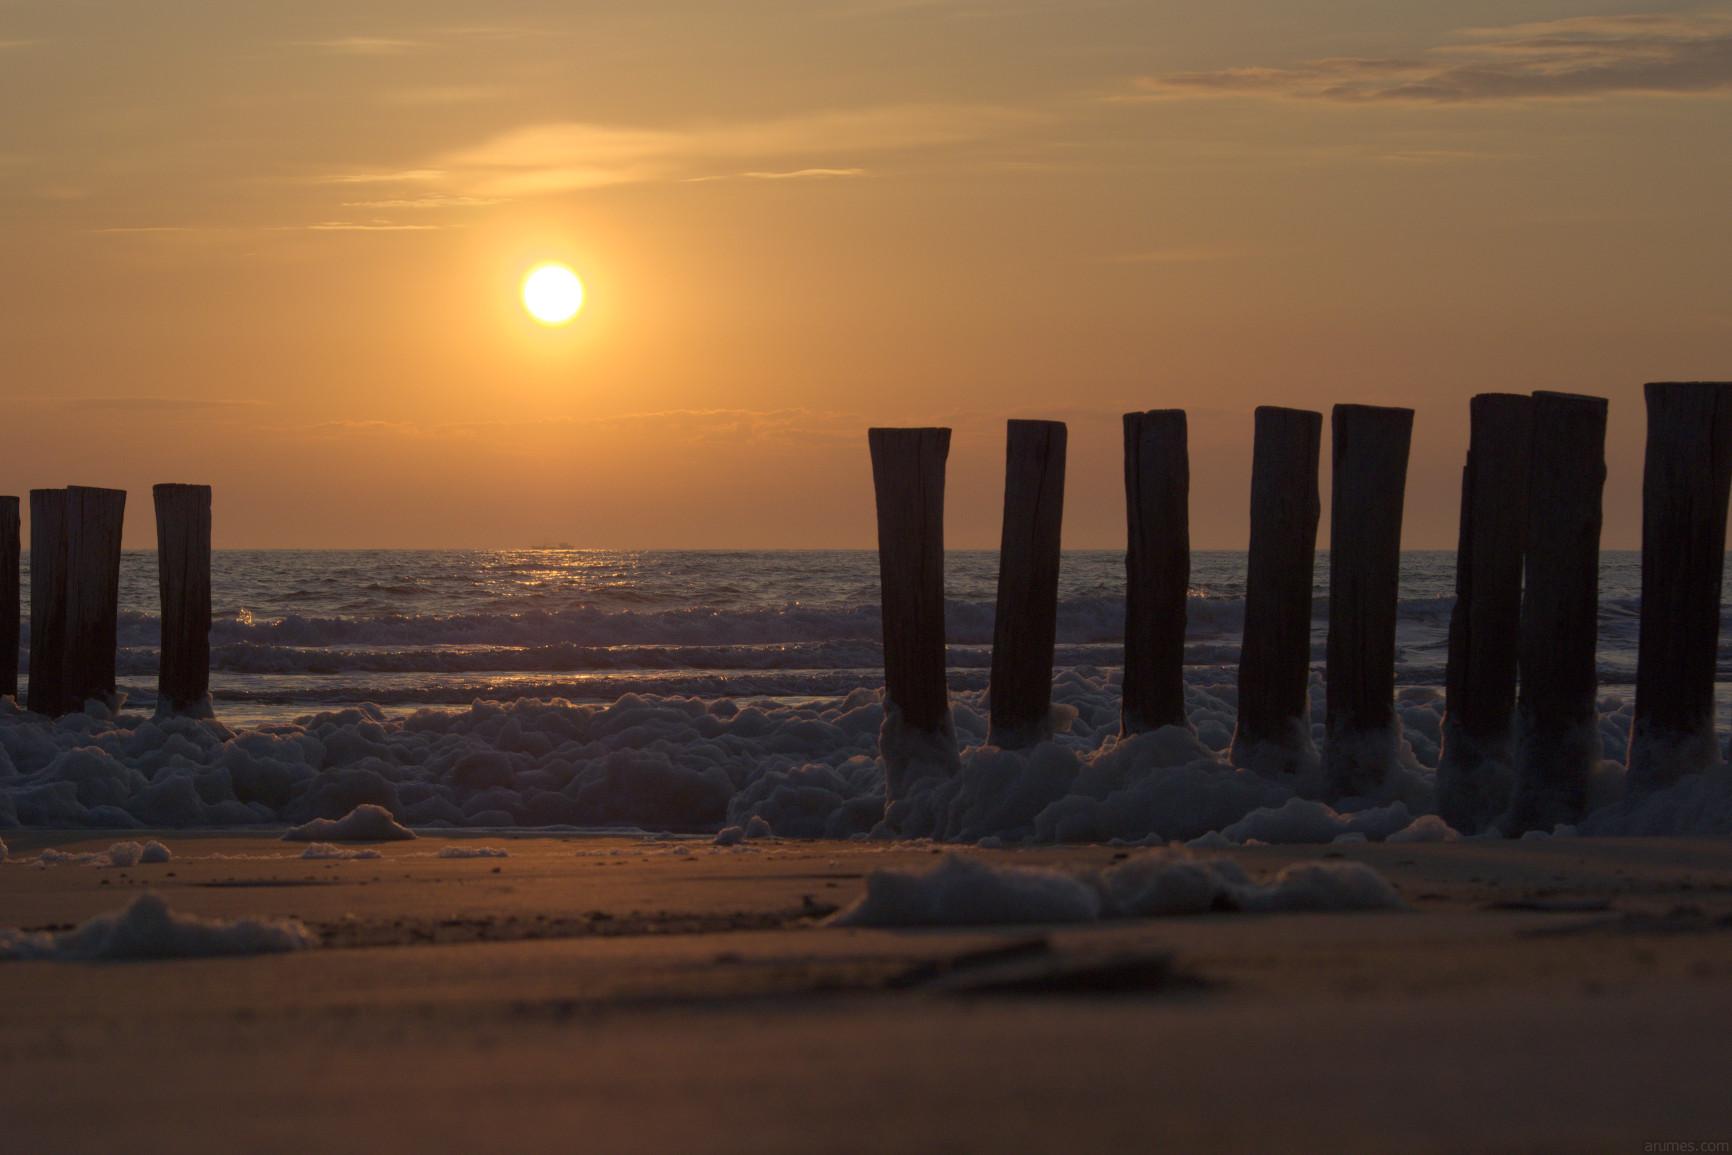 Breakwater at sunset